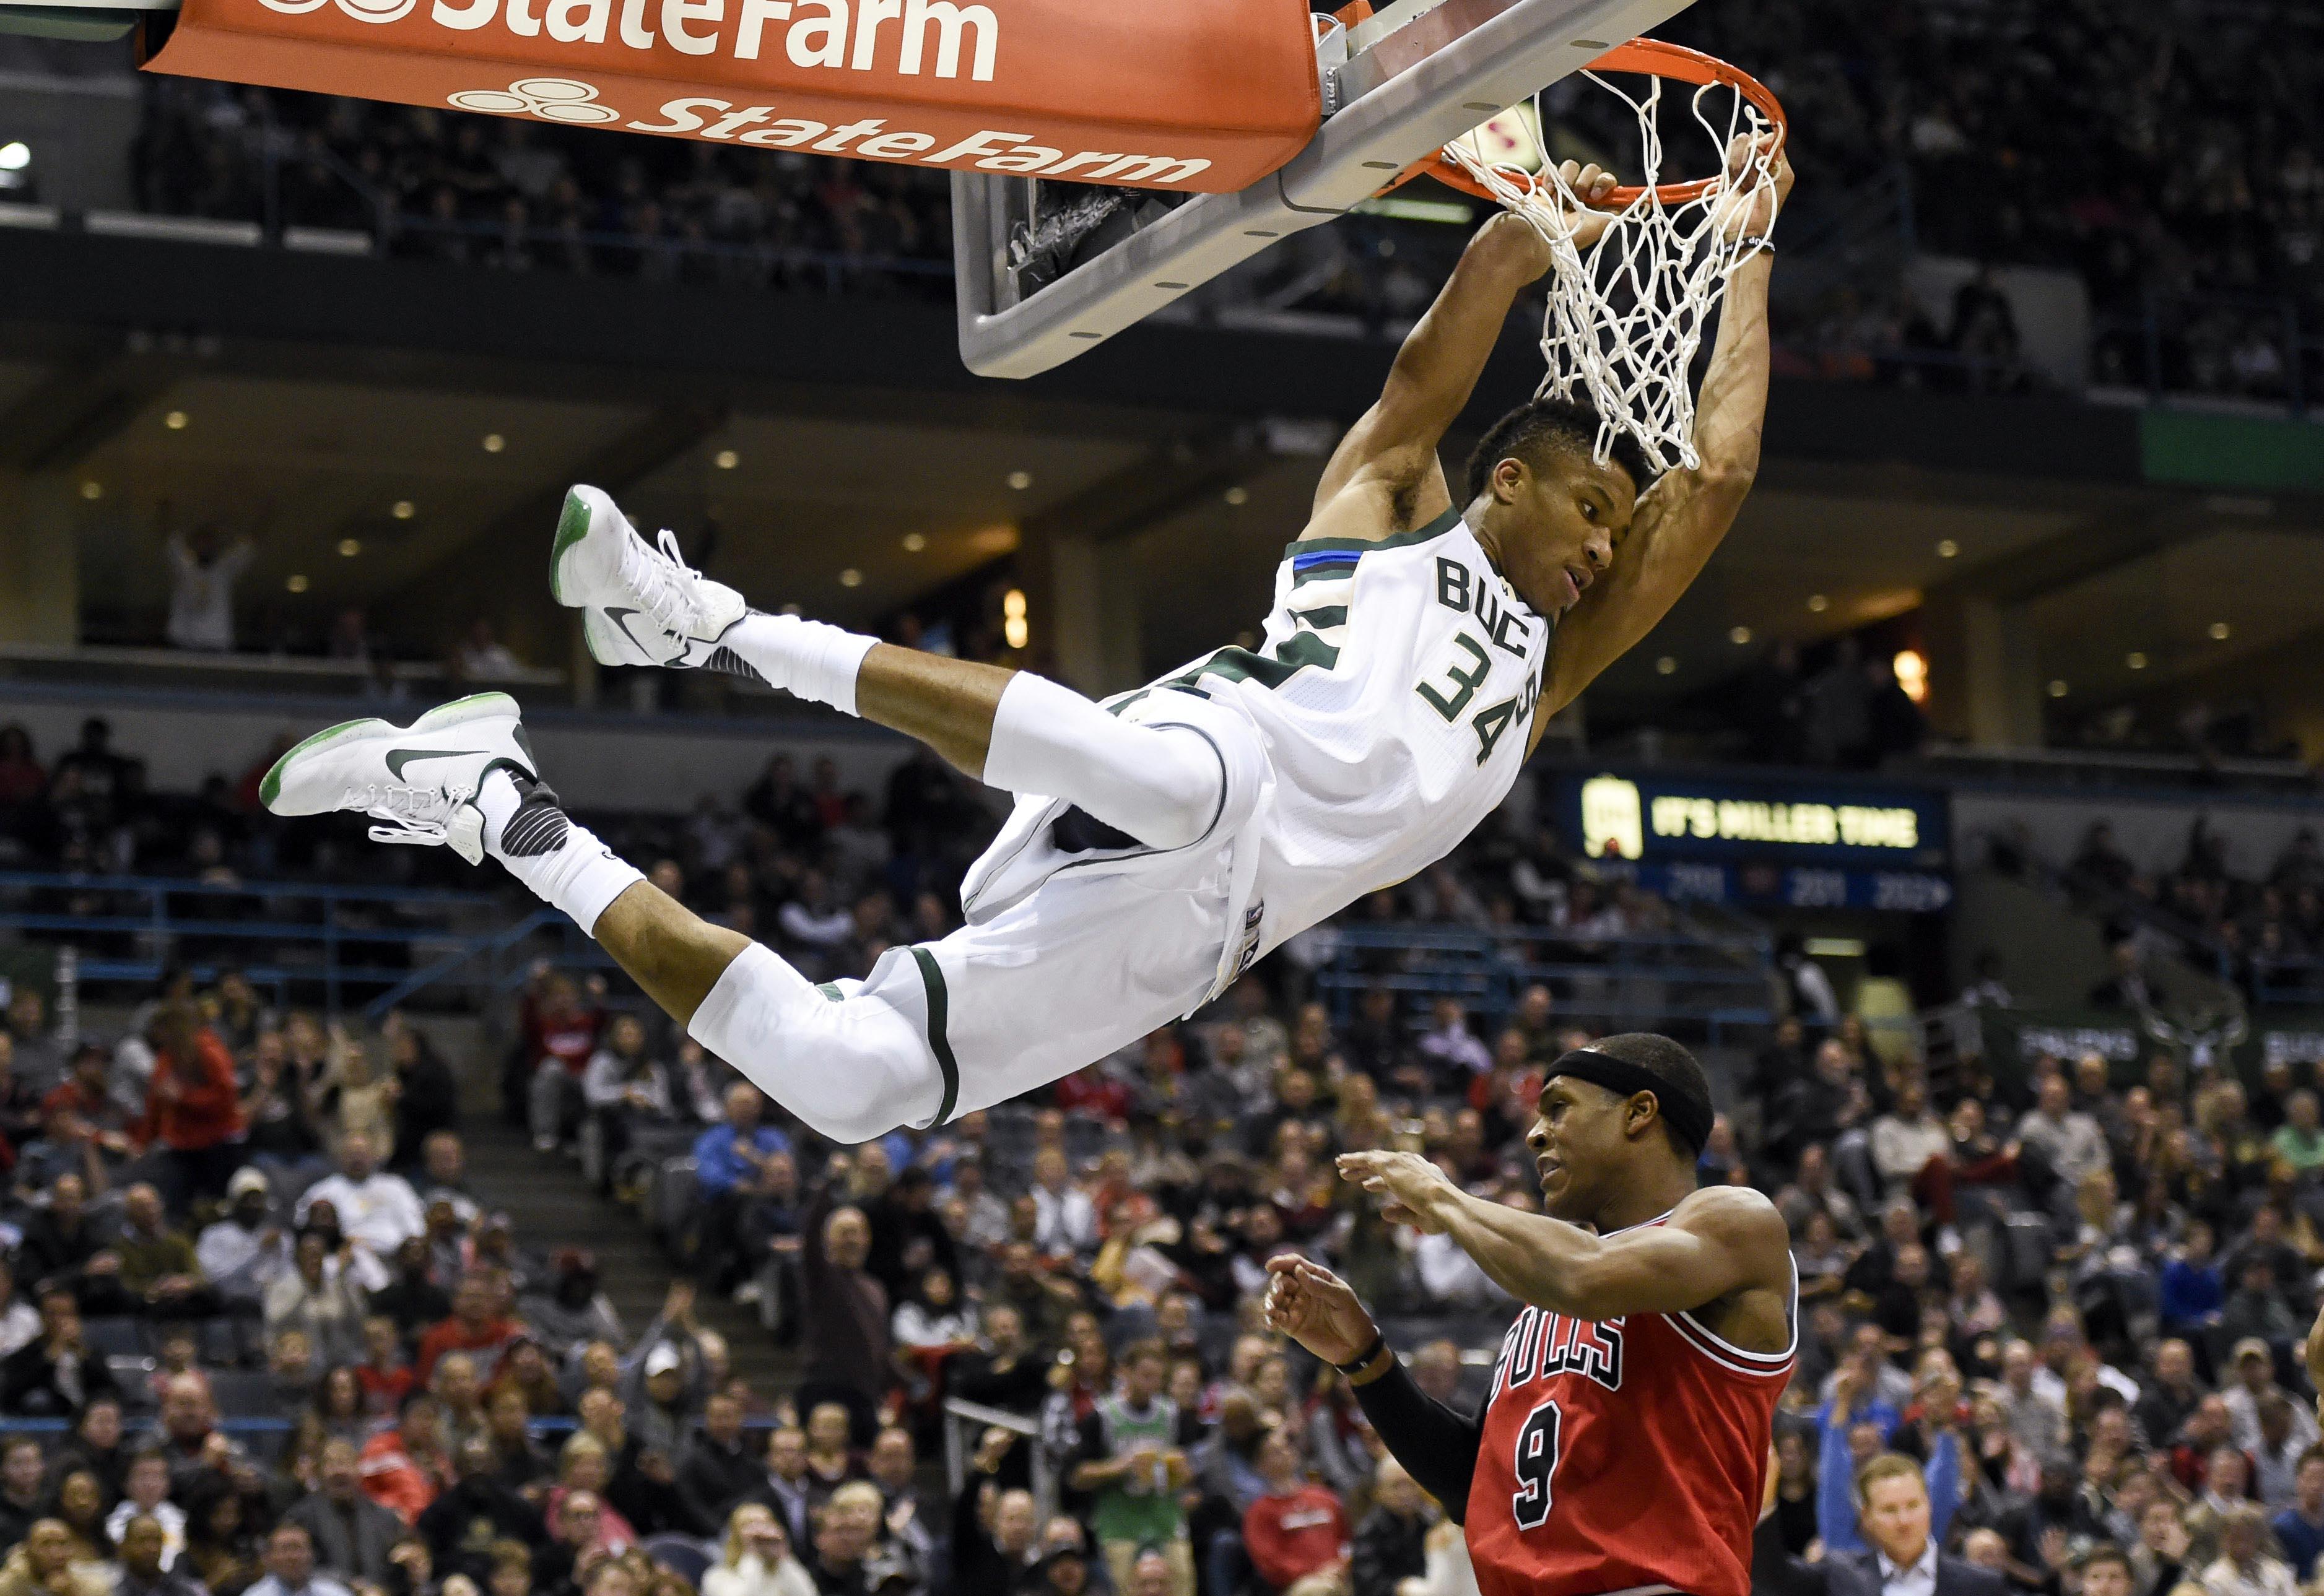 Basket - NBA - Antetokounmpo, la future superstar NBA est déjà All Star